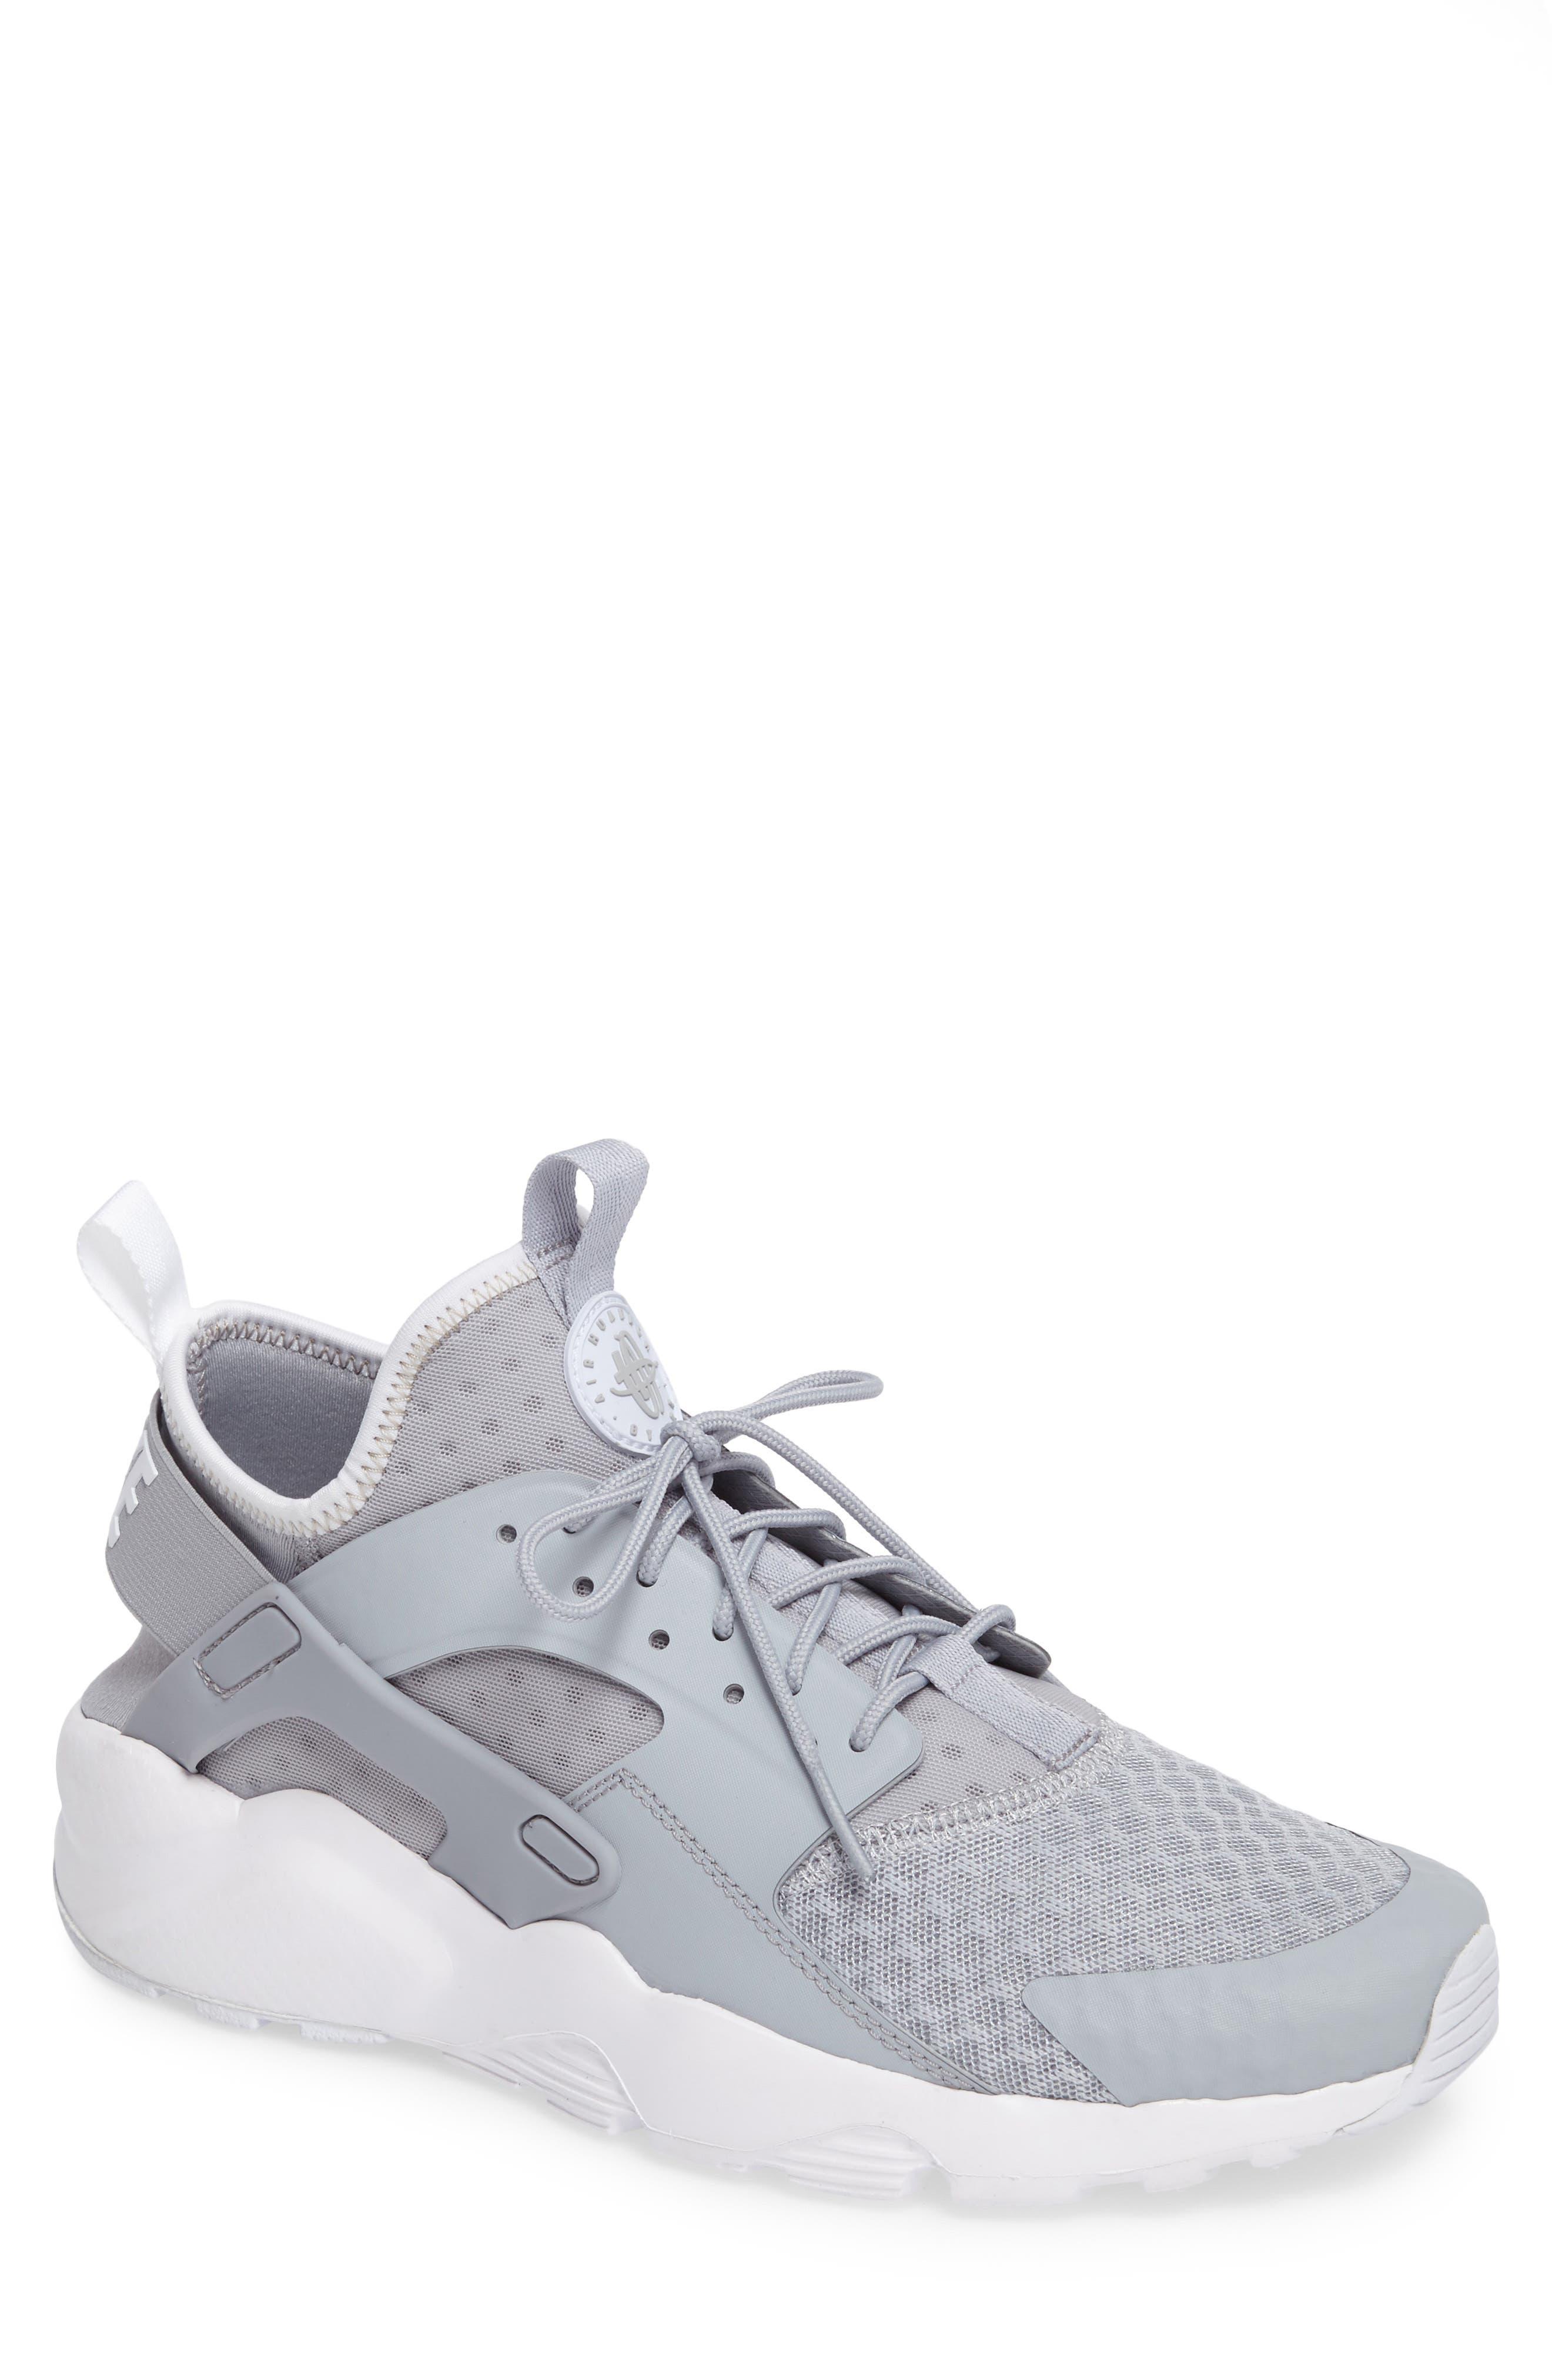 Alternate Image 1 Selected - Nike 'Air Huarache Run Ultra' Sneaker (Men)